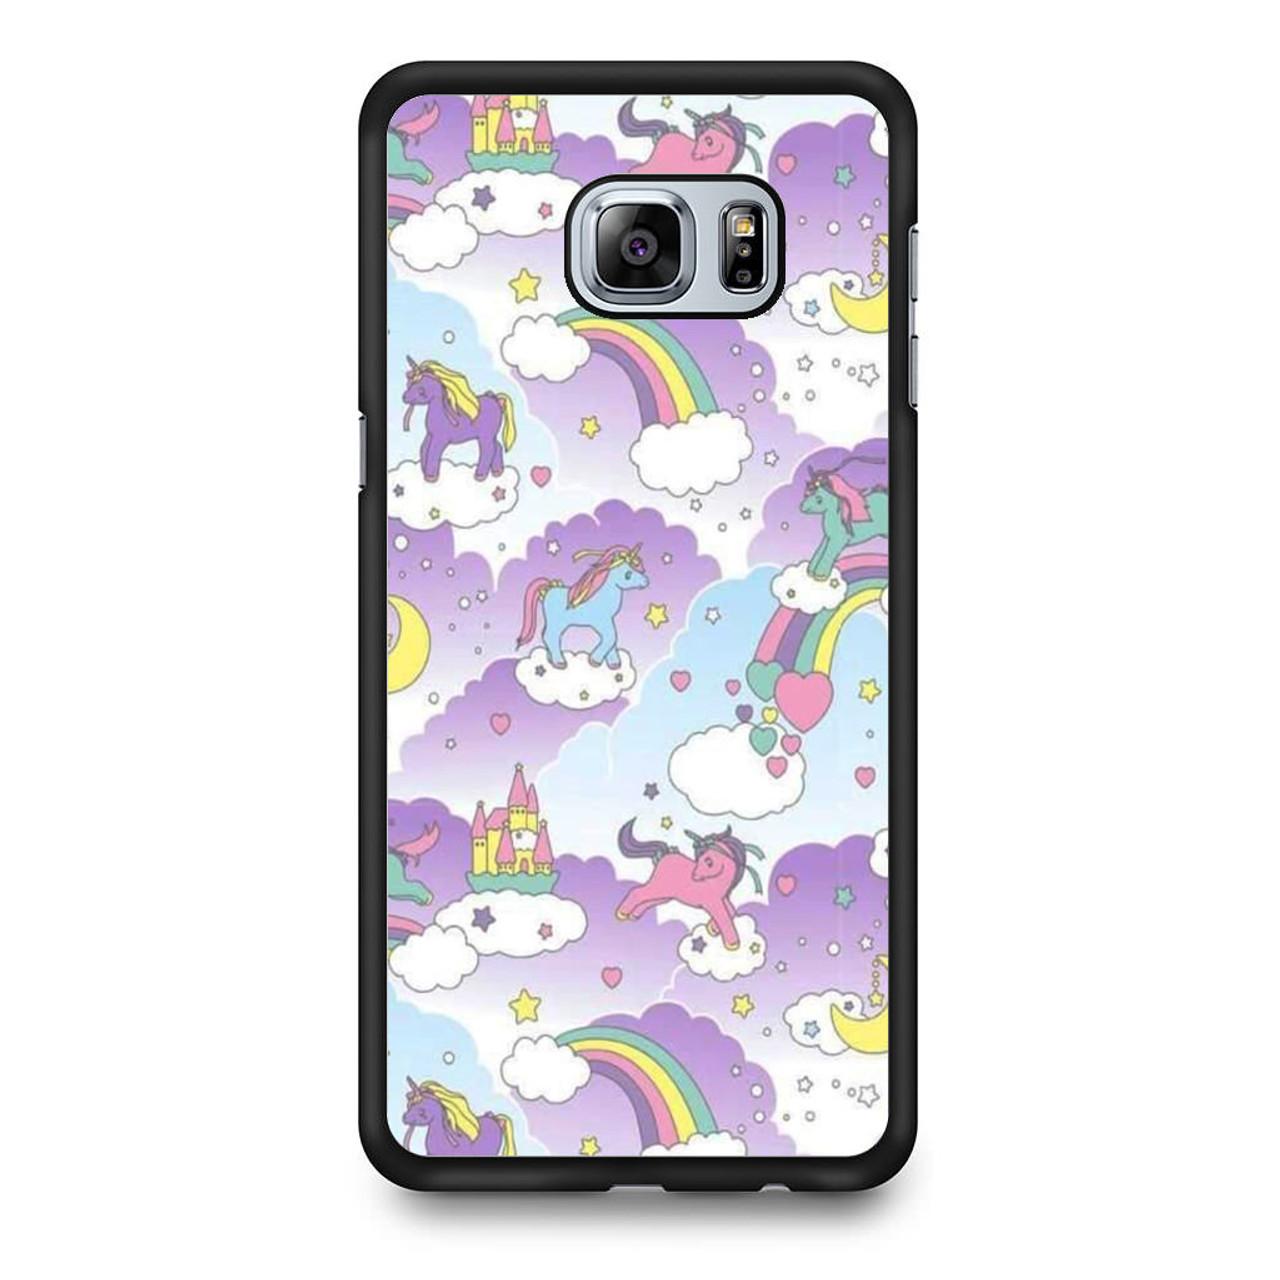 timeless design 86dc0 1b88f Unicorn Samsung Galaxy S6 Edge Plus Case